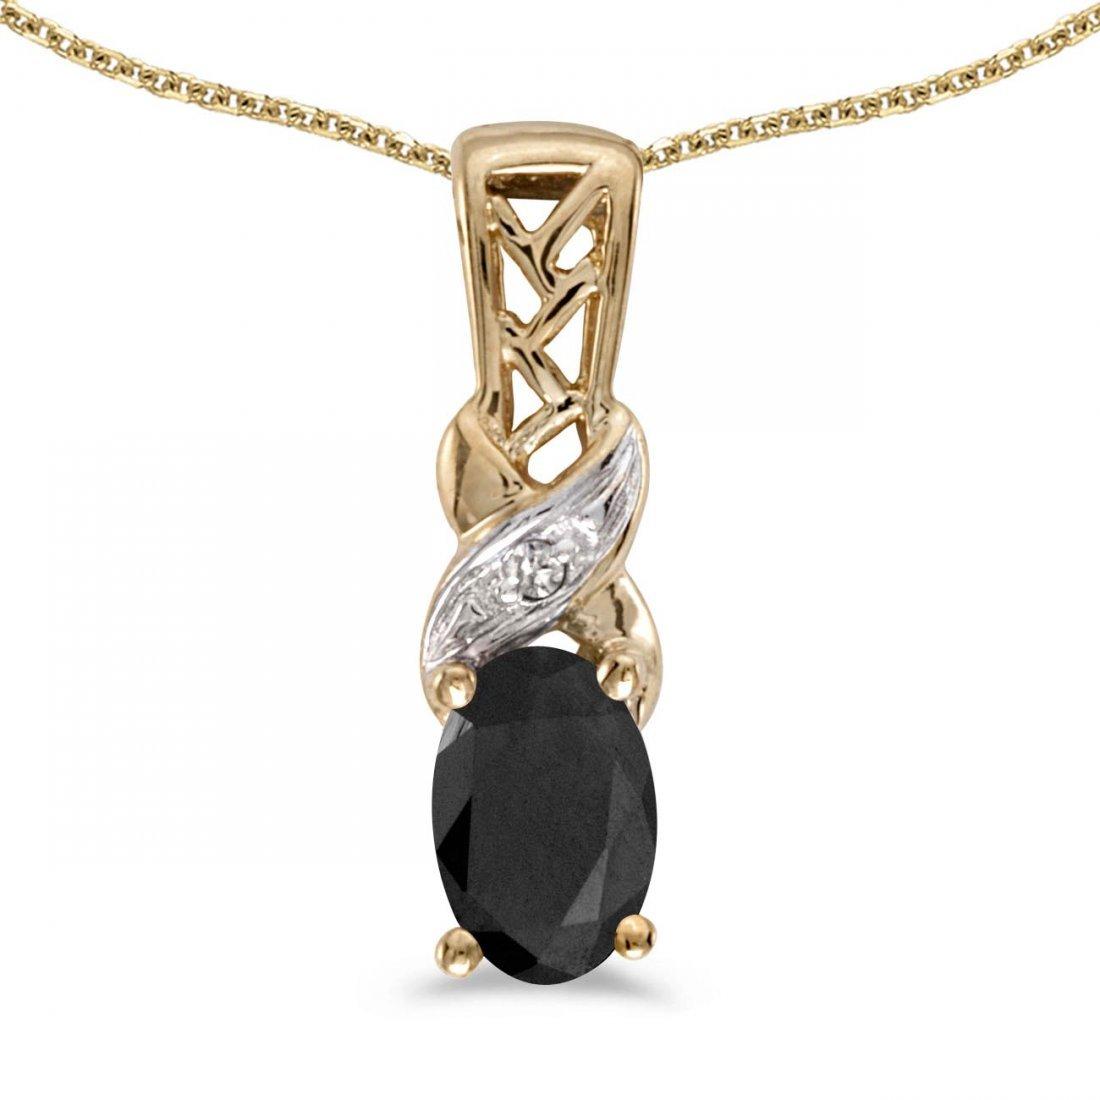 Certified 14k Yellow Gold Oval Onyx And Diamond Pendant